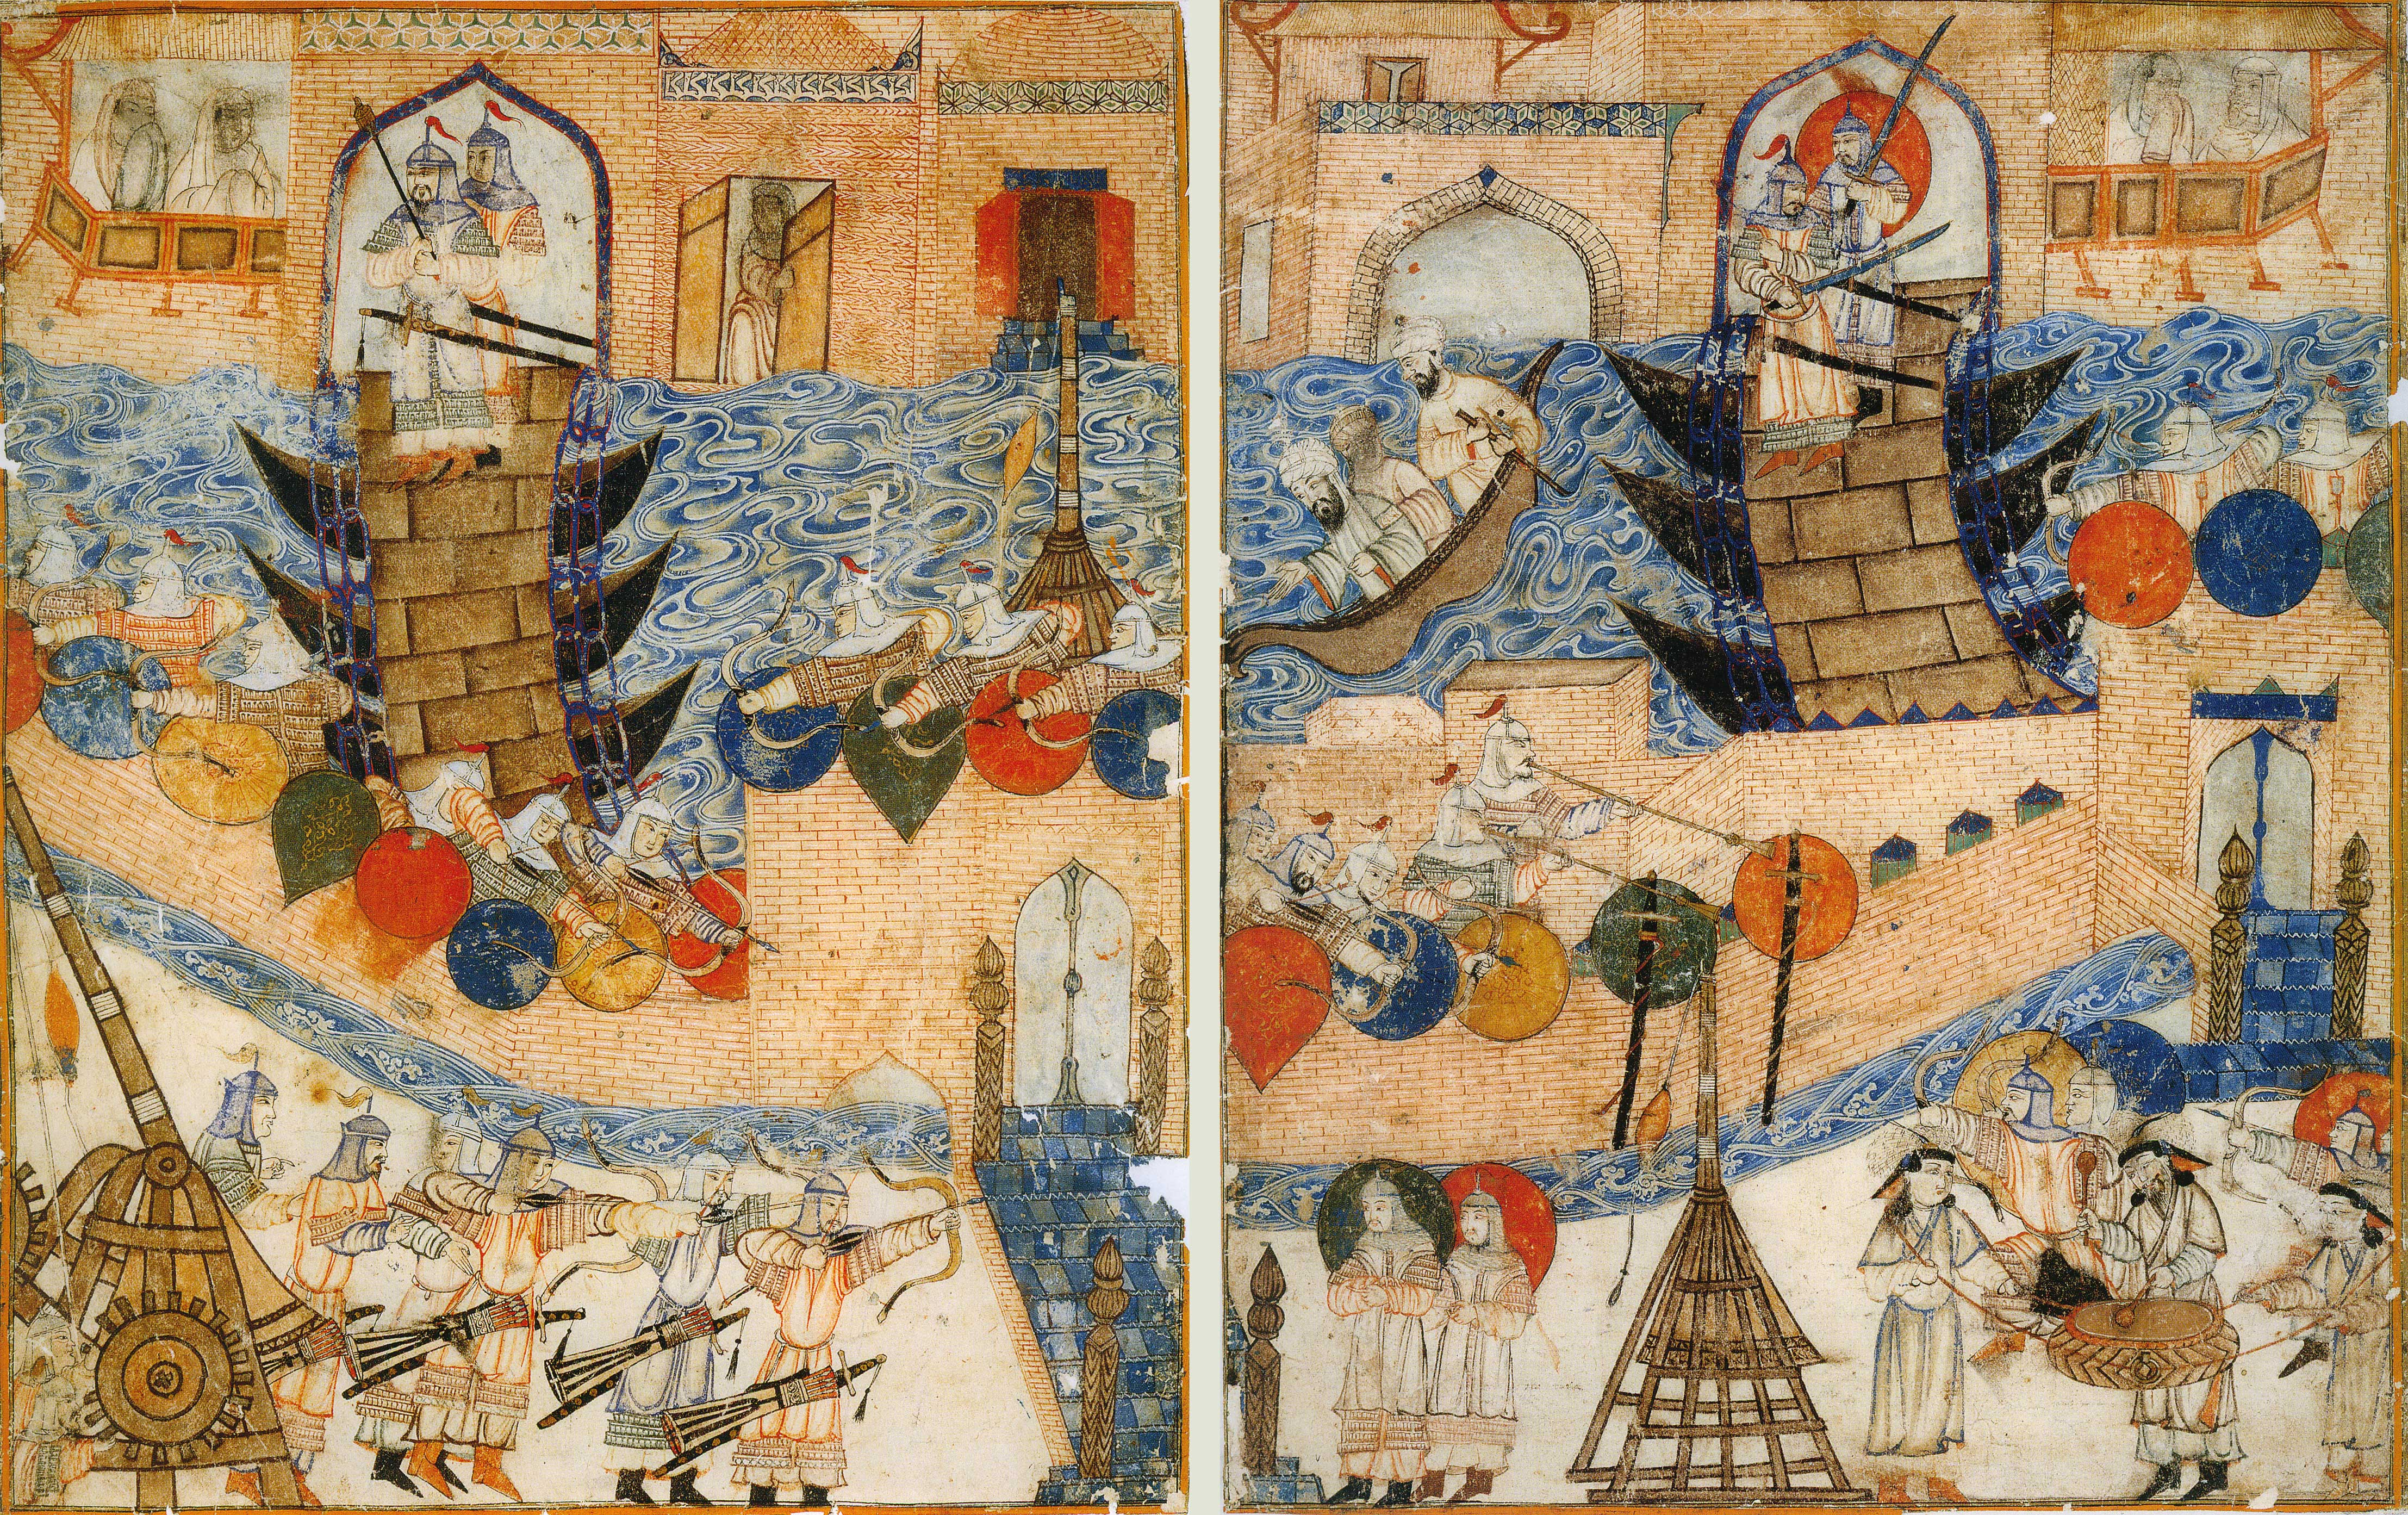 Штурм крепости. Арабская картина